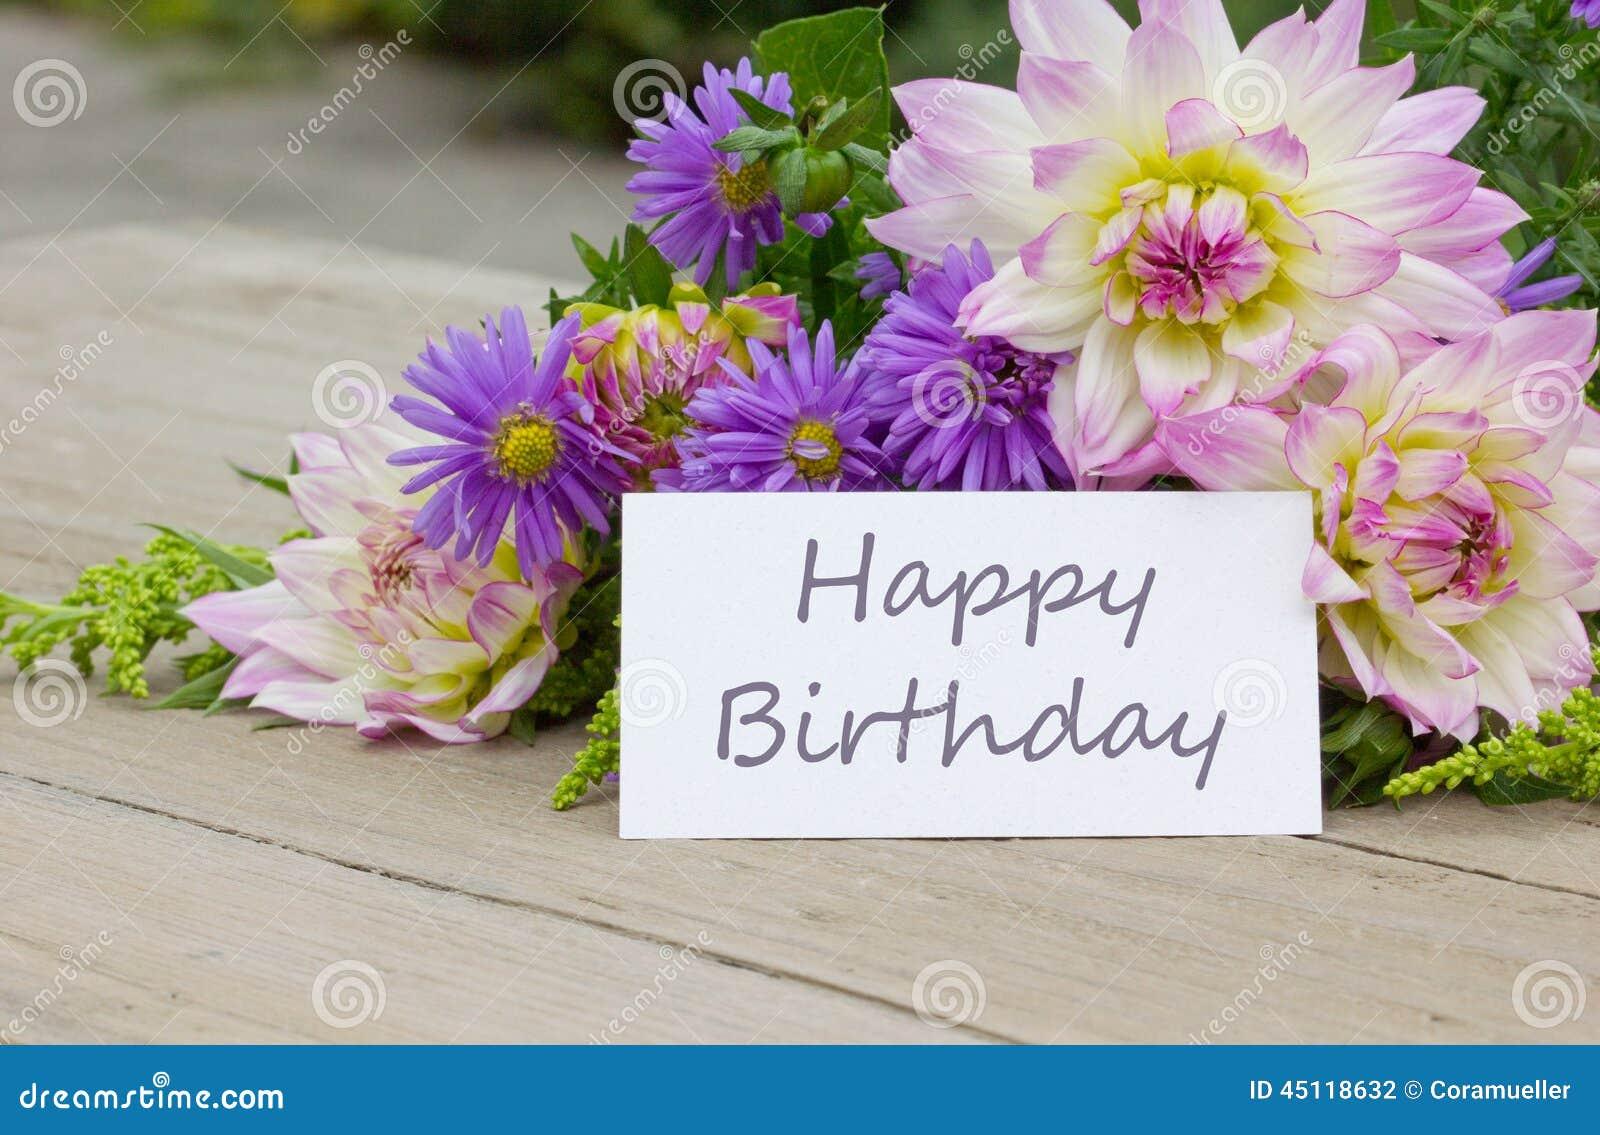 Happy Birthday stock photo. Image of flowers, wood, blue   45118632